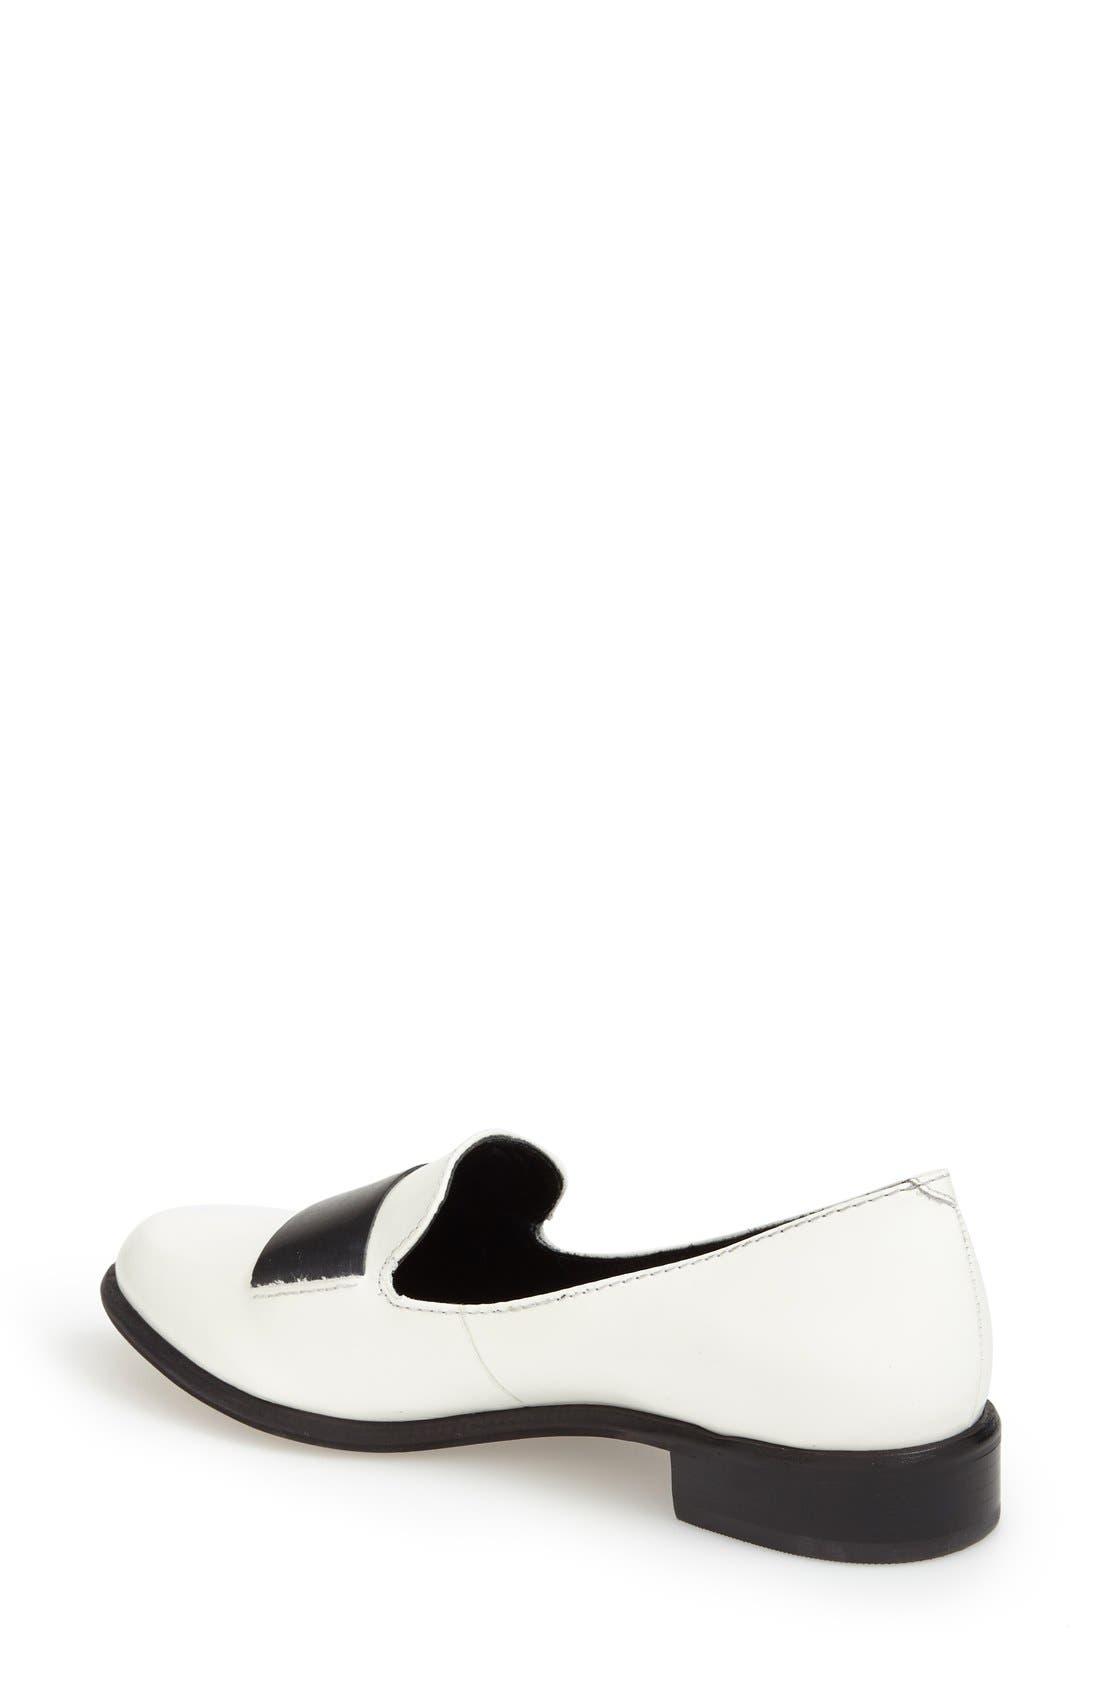 M4D3 'Ocean' Flat Loafer,                             Alternate thumbnail 7, color,